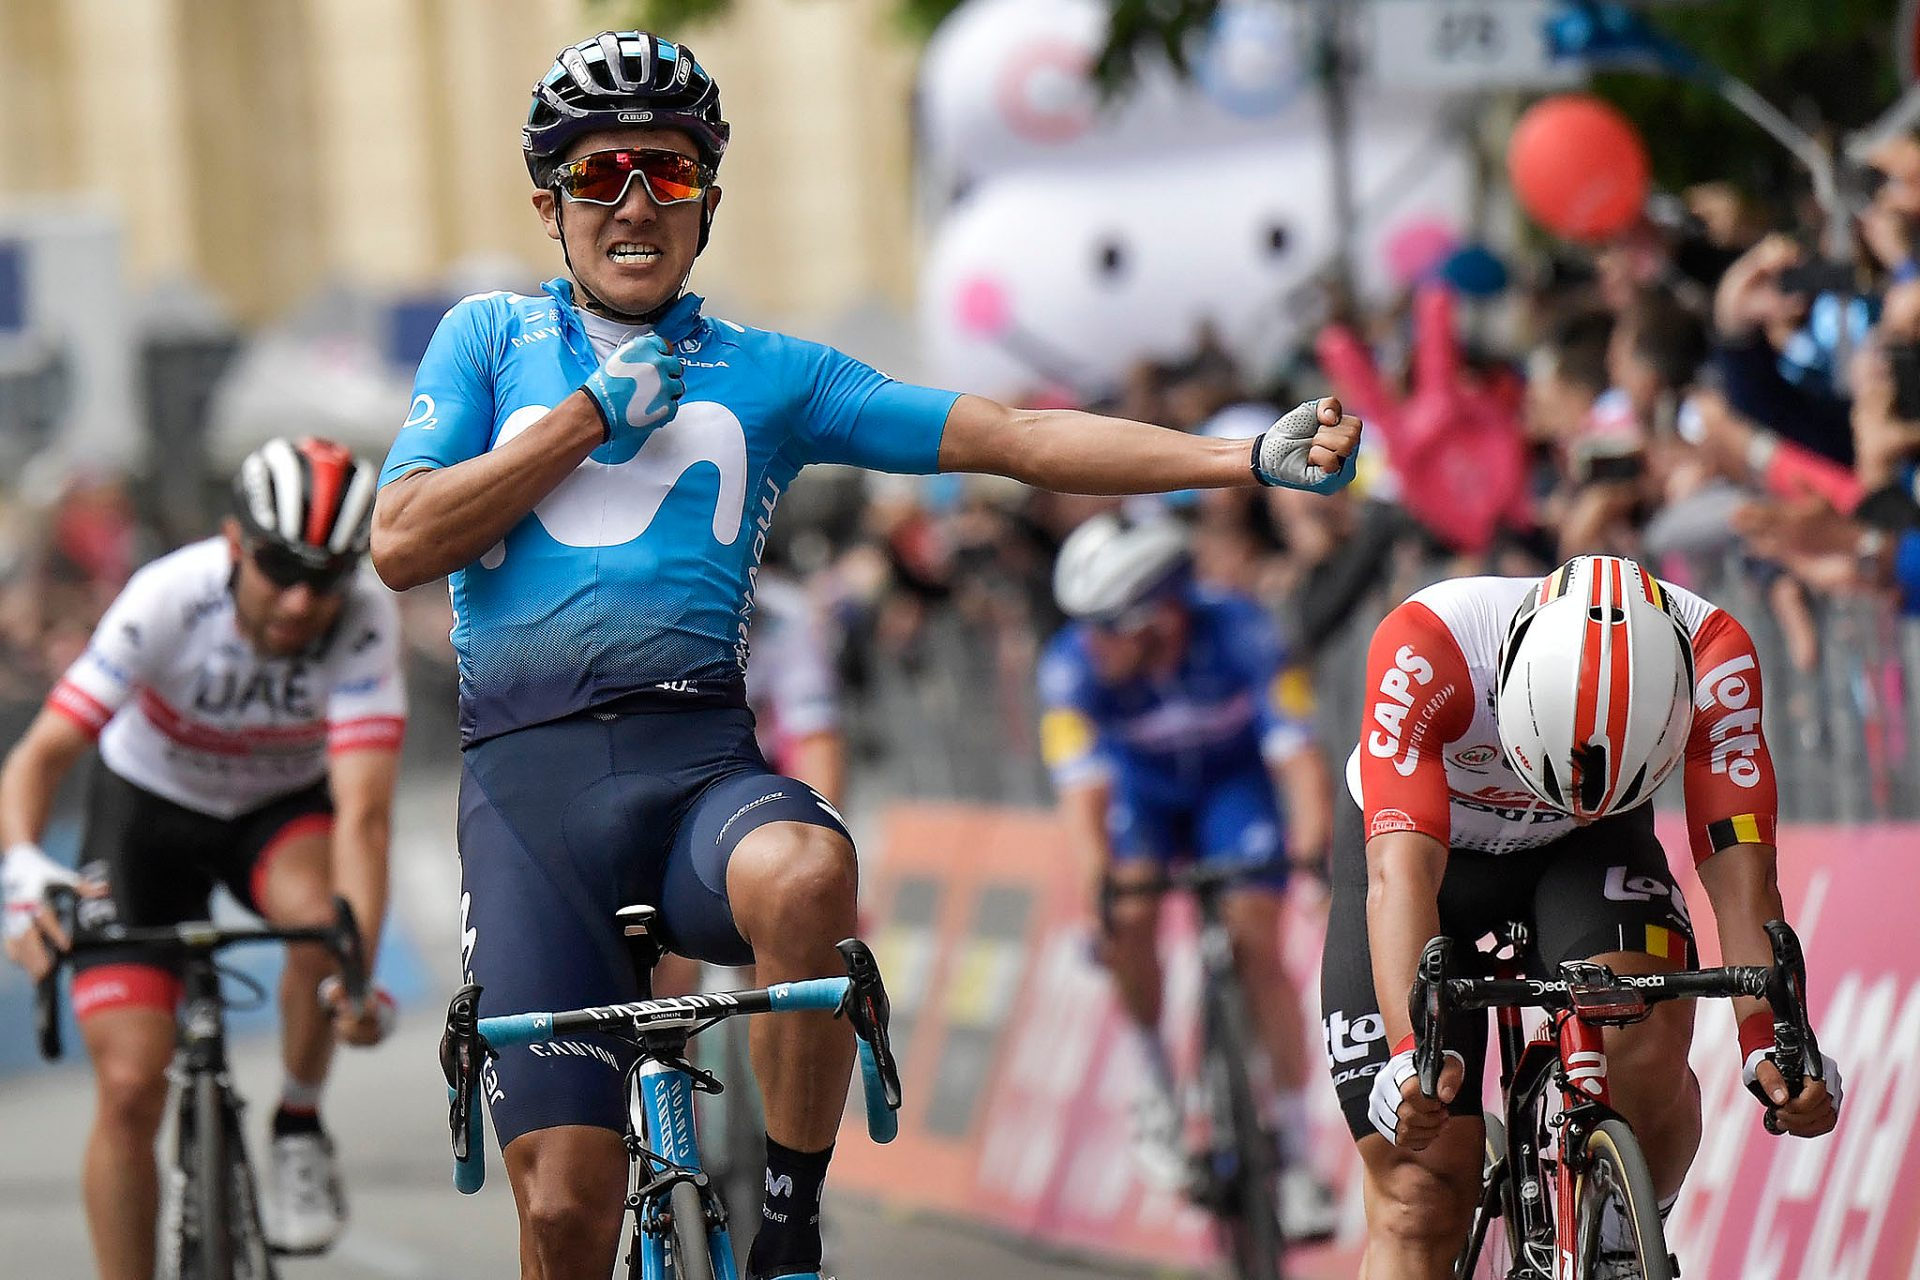 2019 Giro D'Italia Stage 4 Recap & Results 6